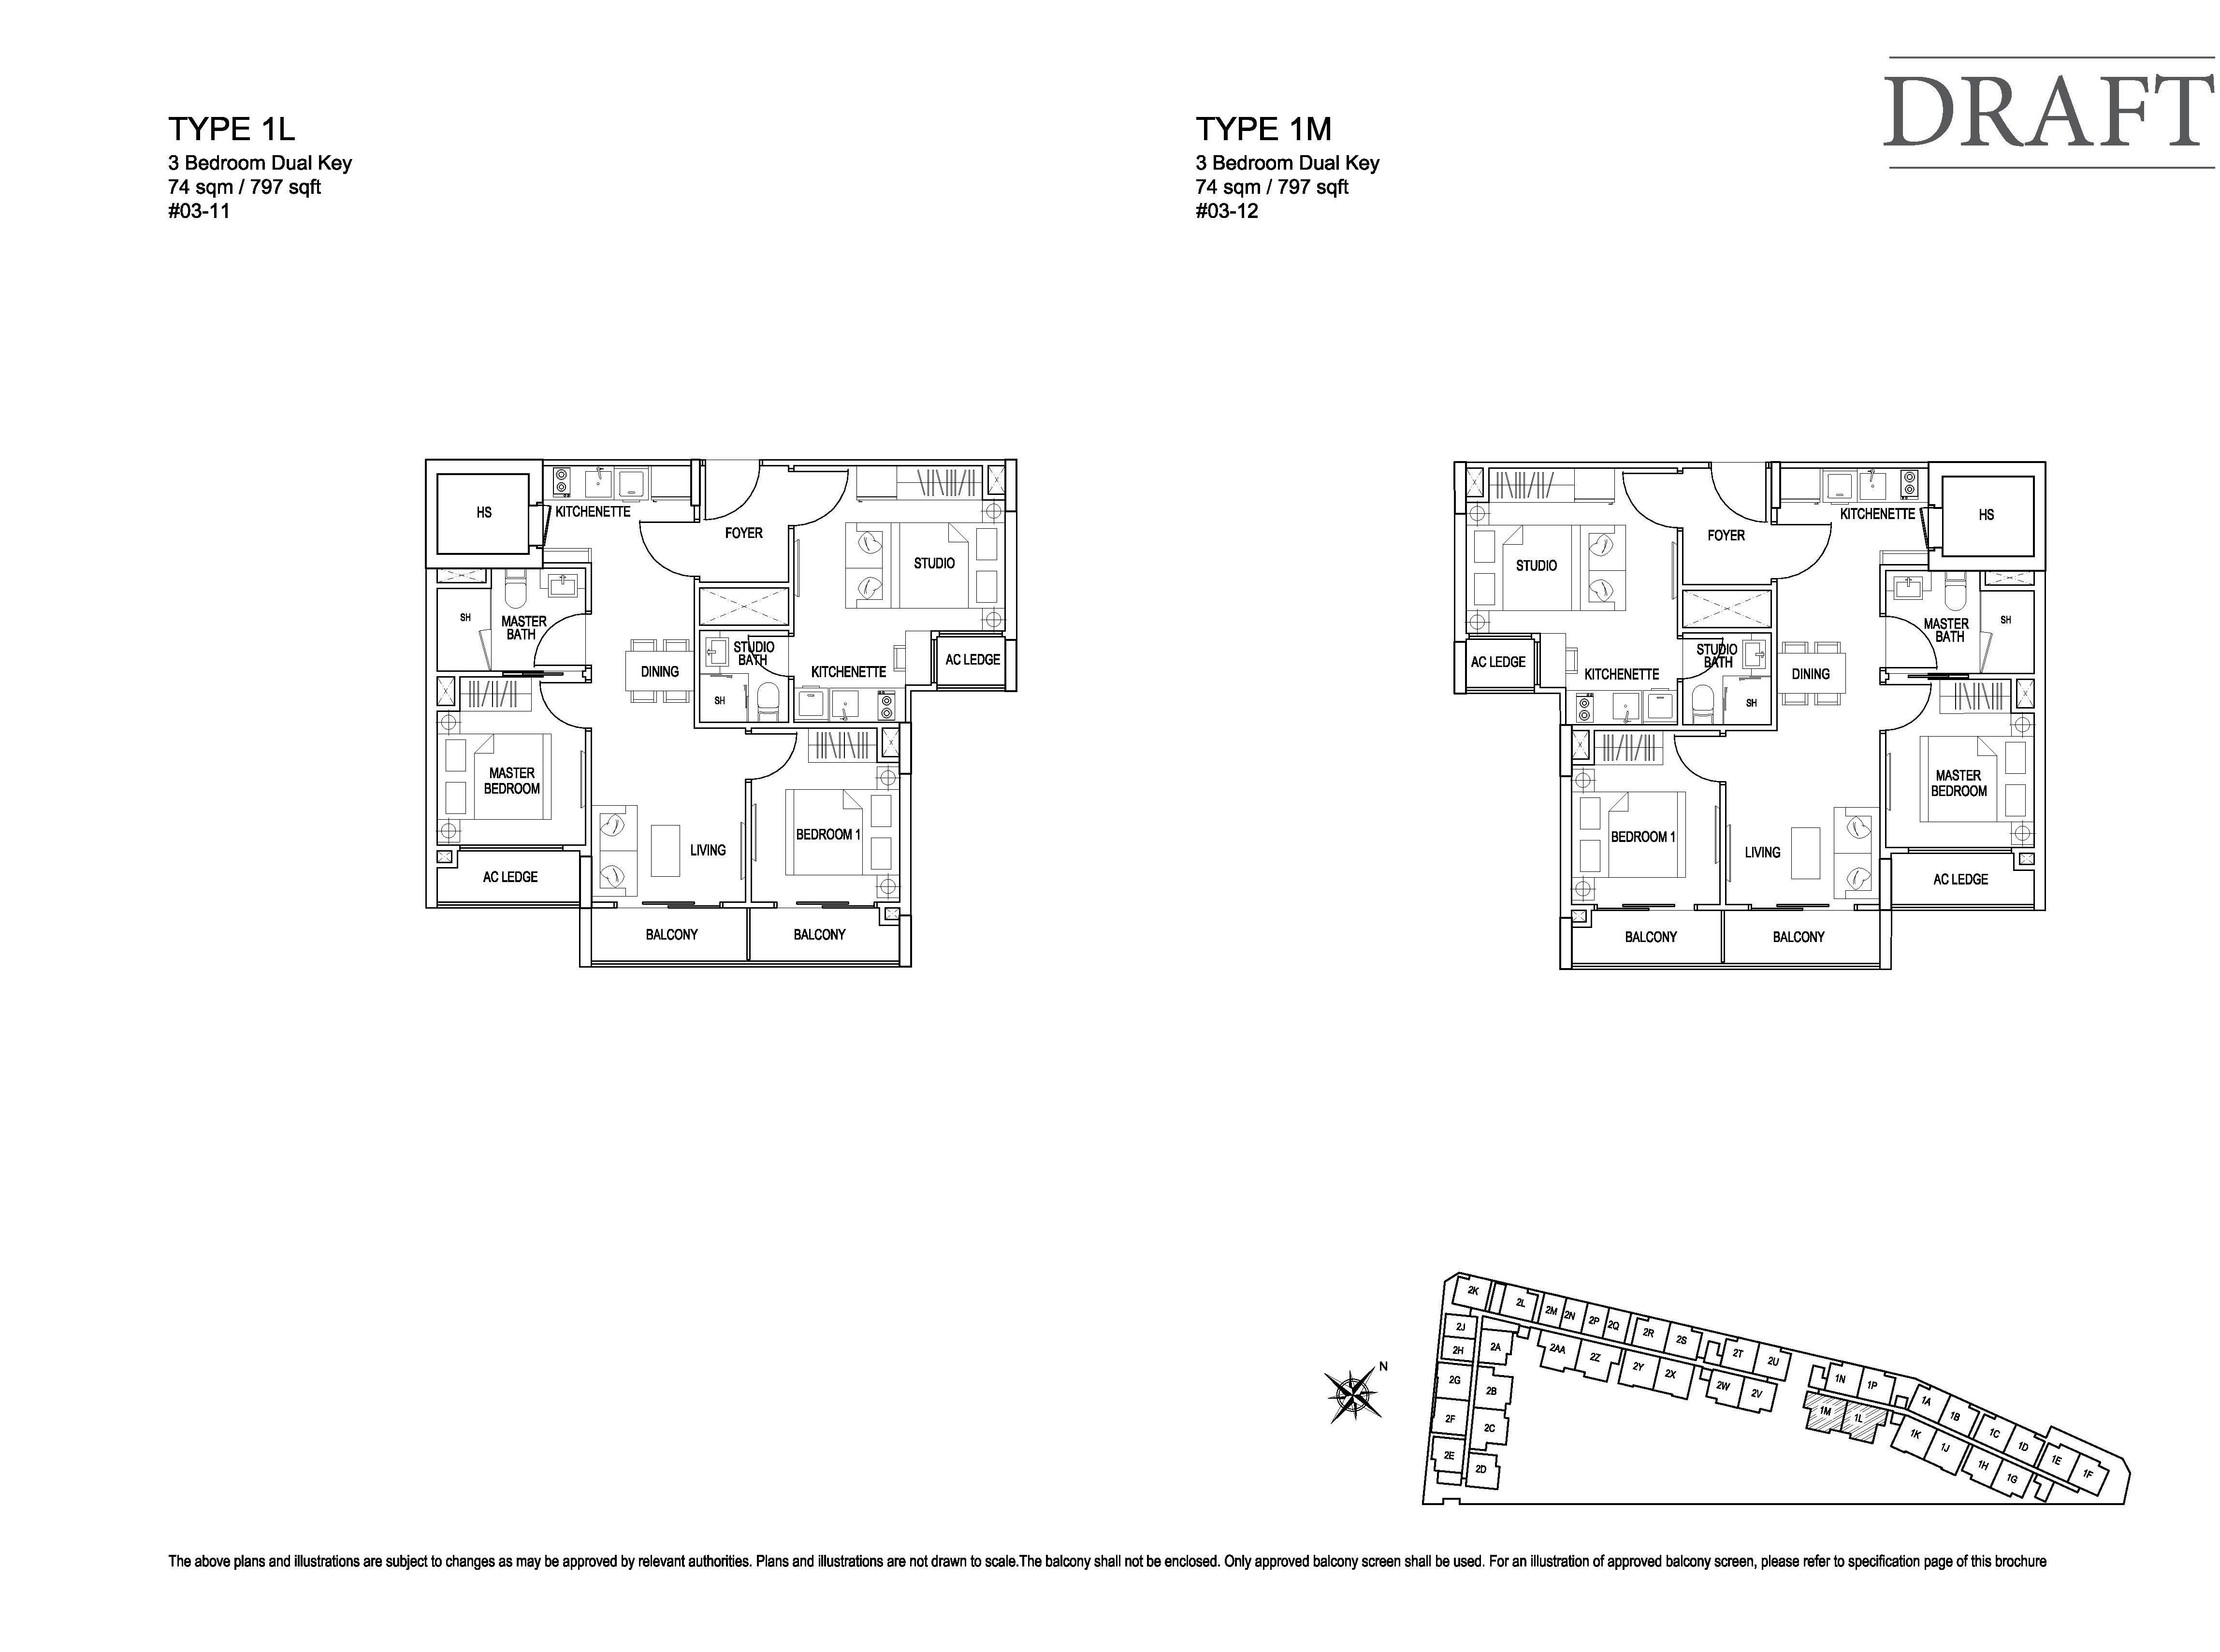 Kensington Square 3 Bedroom Dual Key Floor Plans Type 1L, 1M